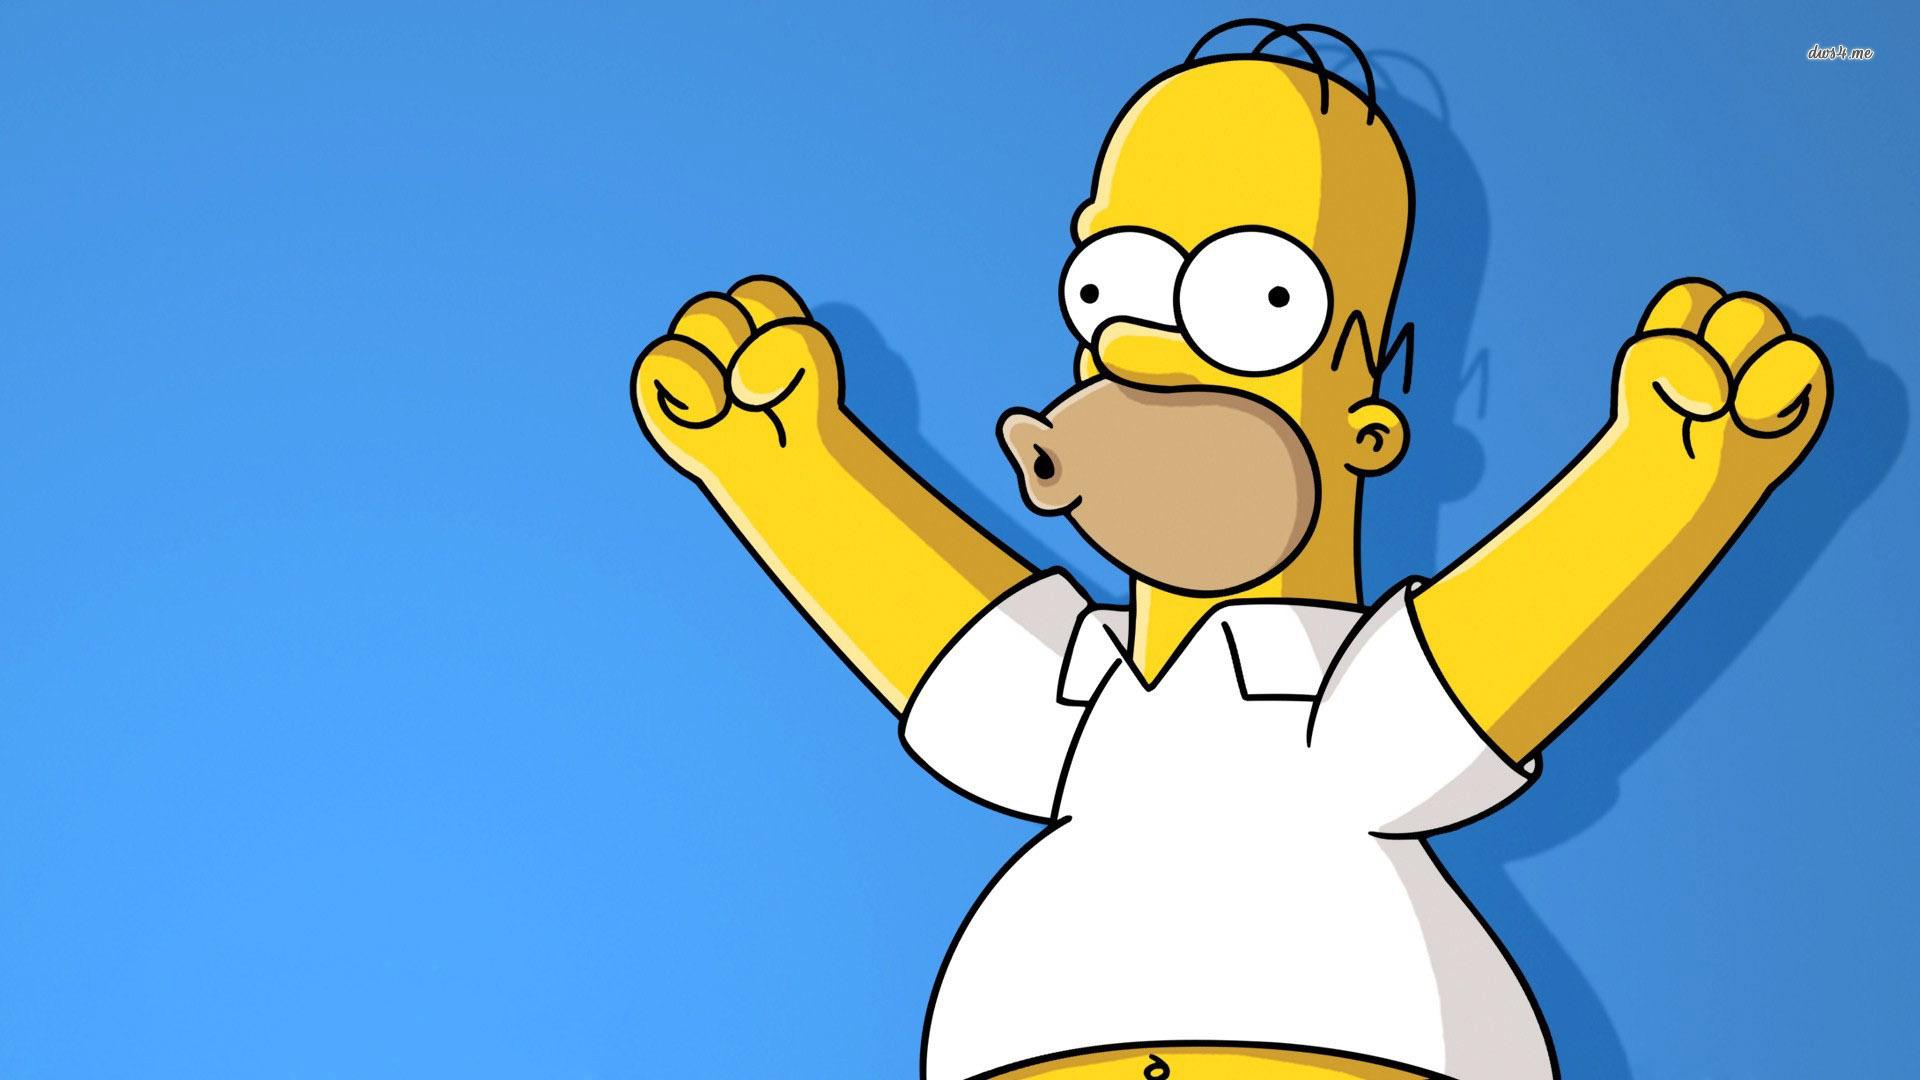 Cool Homer Simpson Wallpaper 22967 1920x1200 px